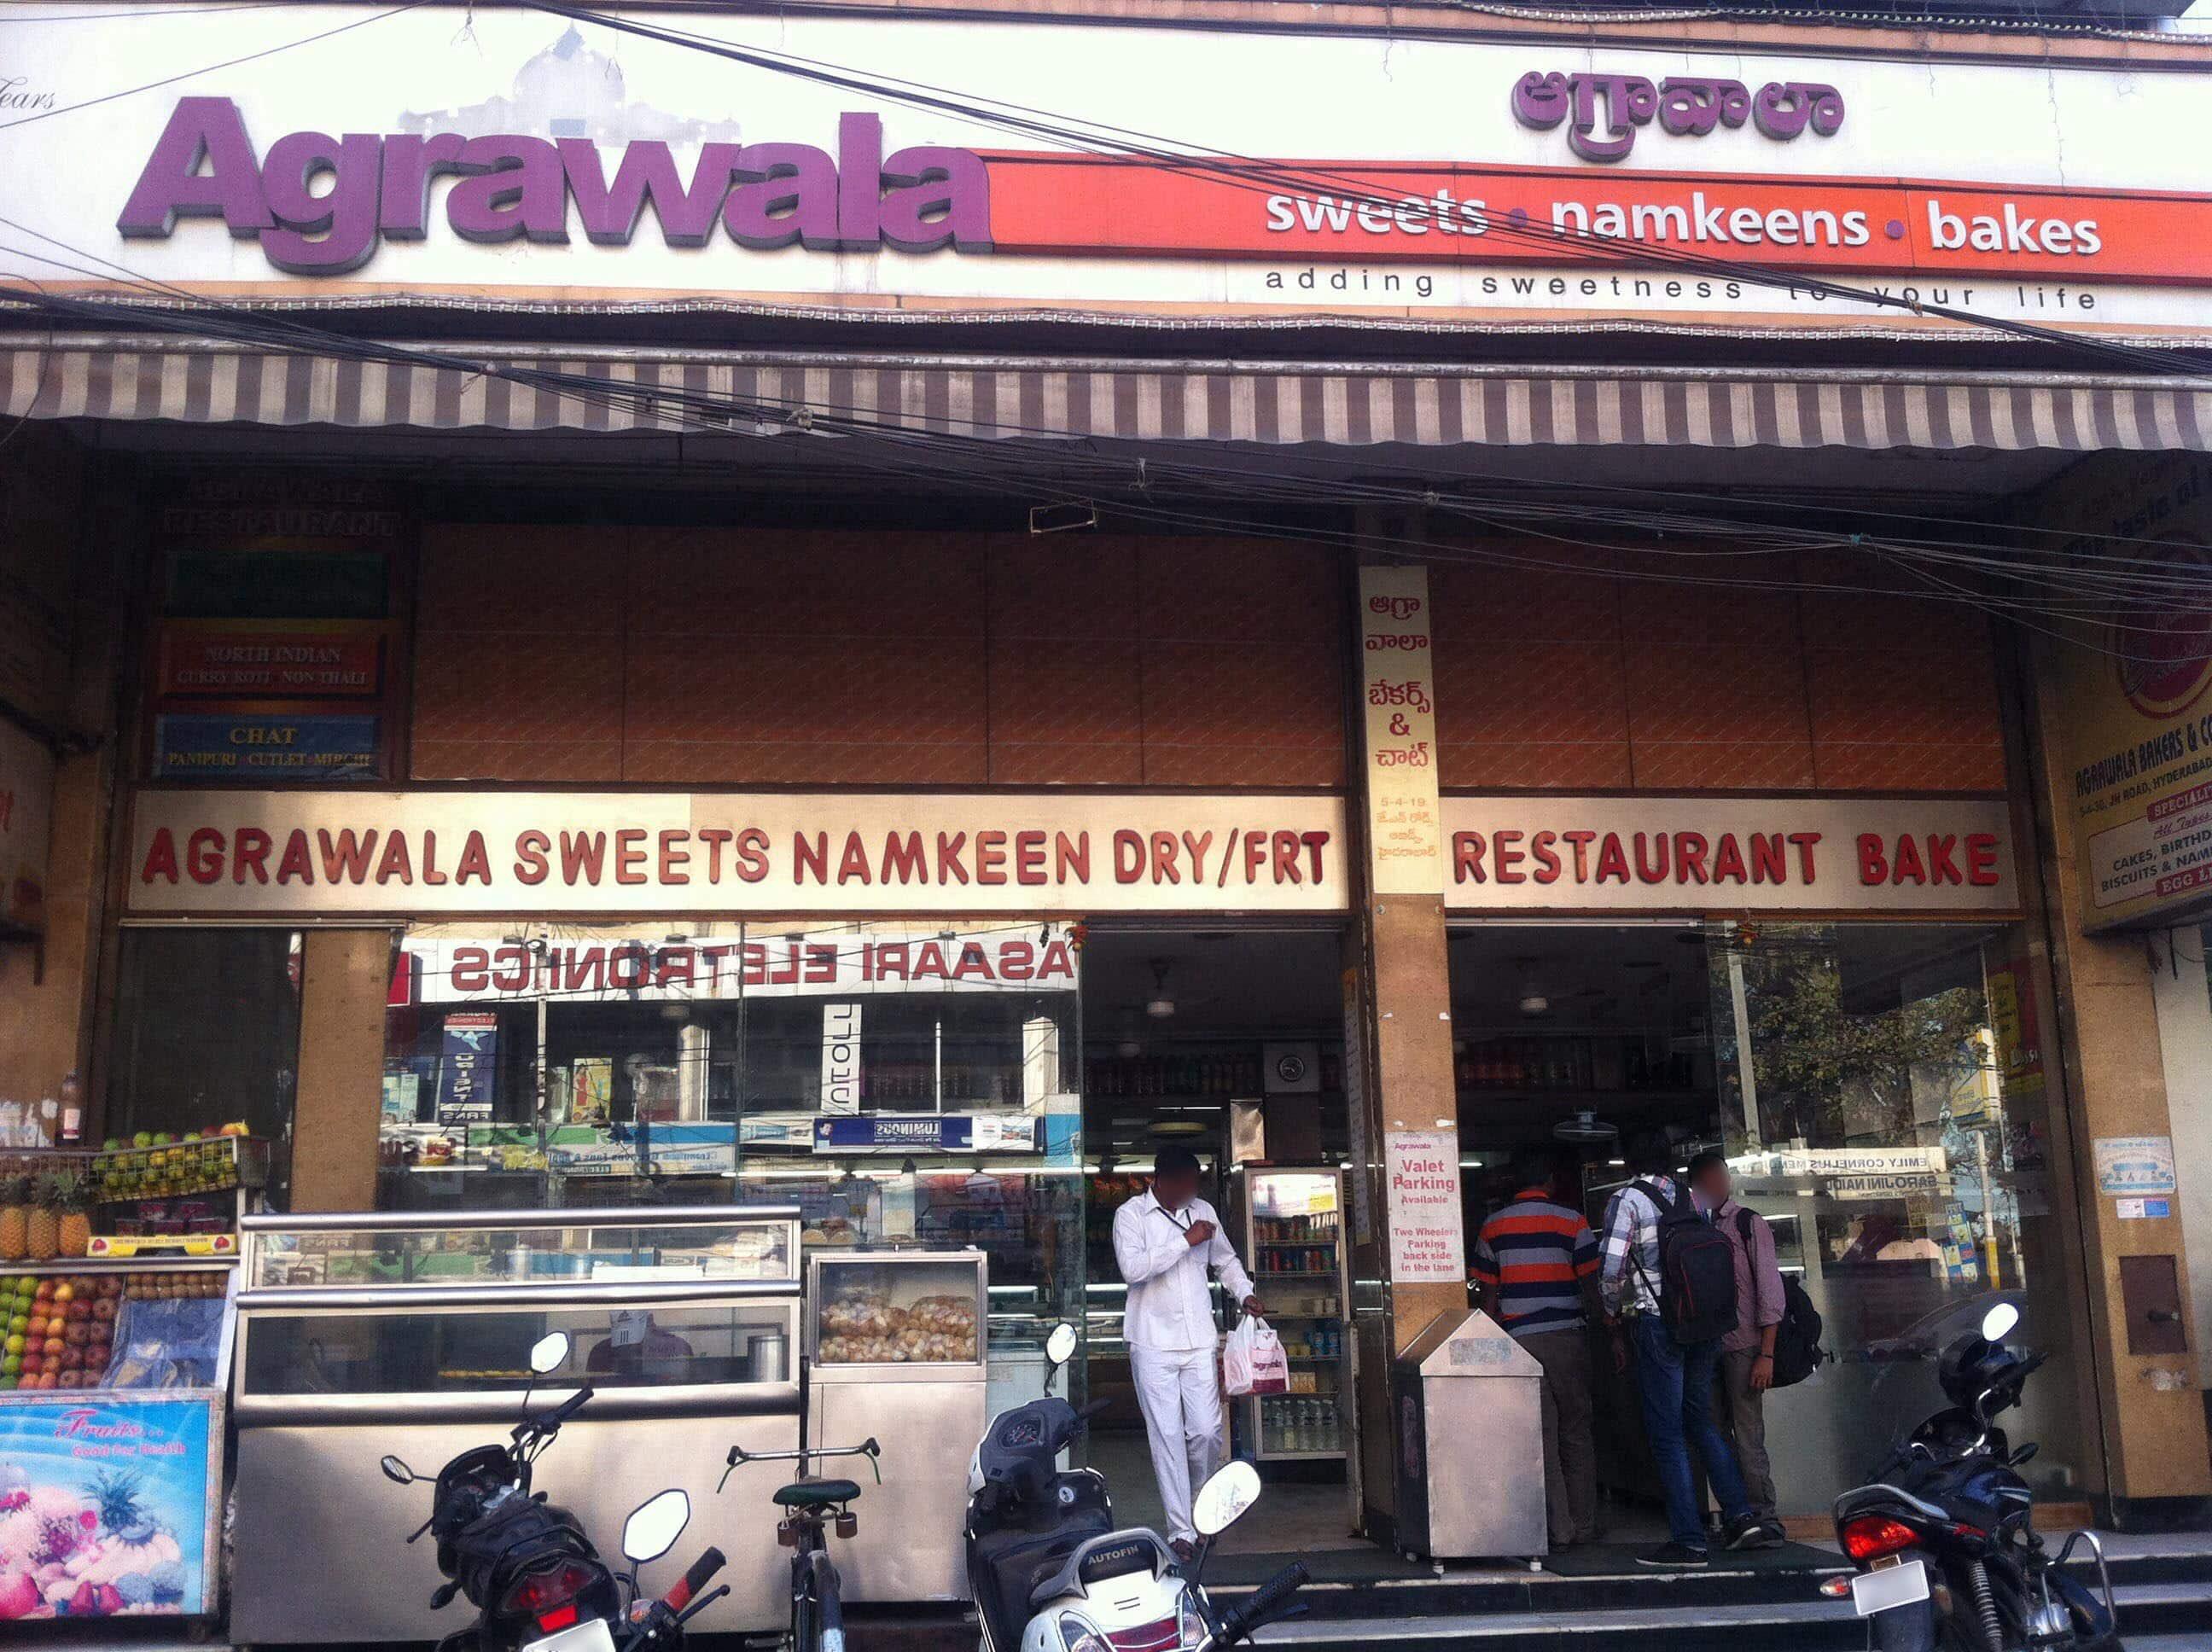 Agrawala agrawala sweets, abids, hyderabad - zomato